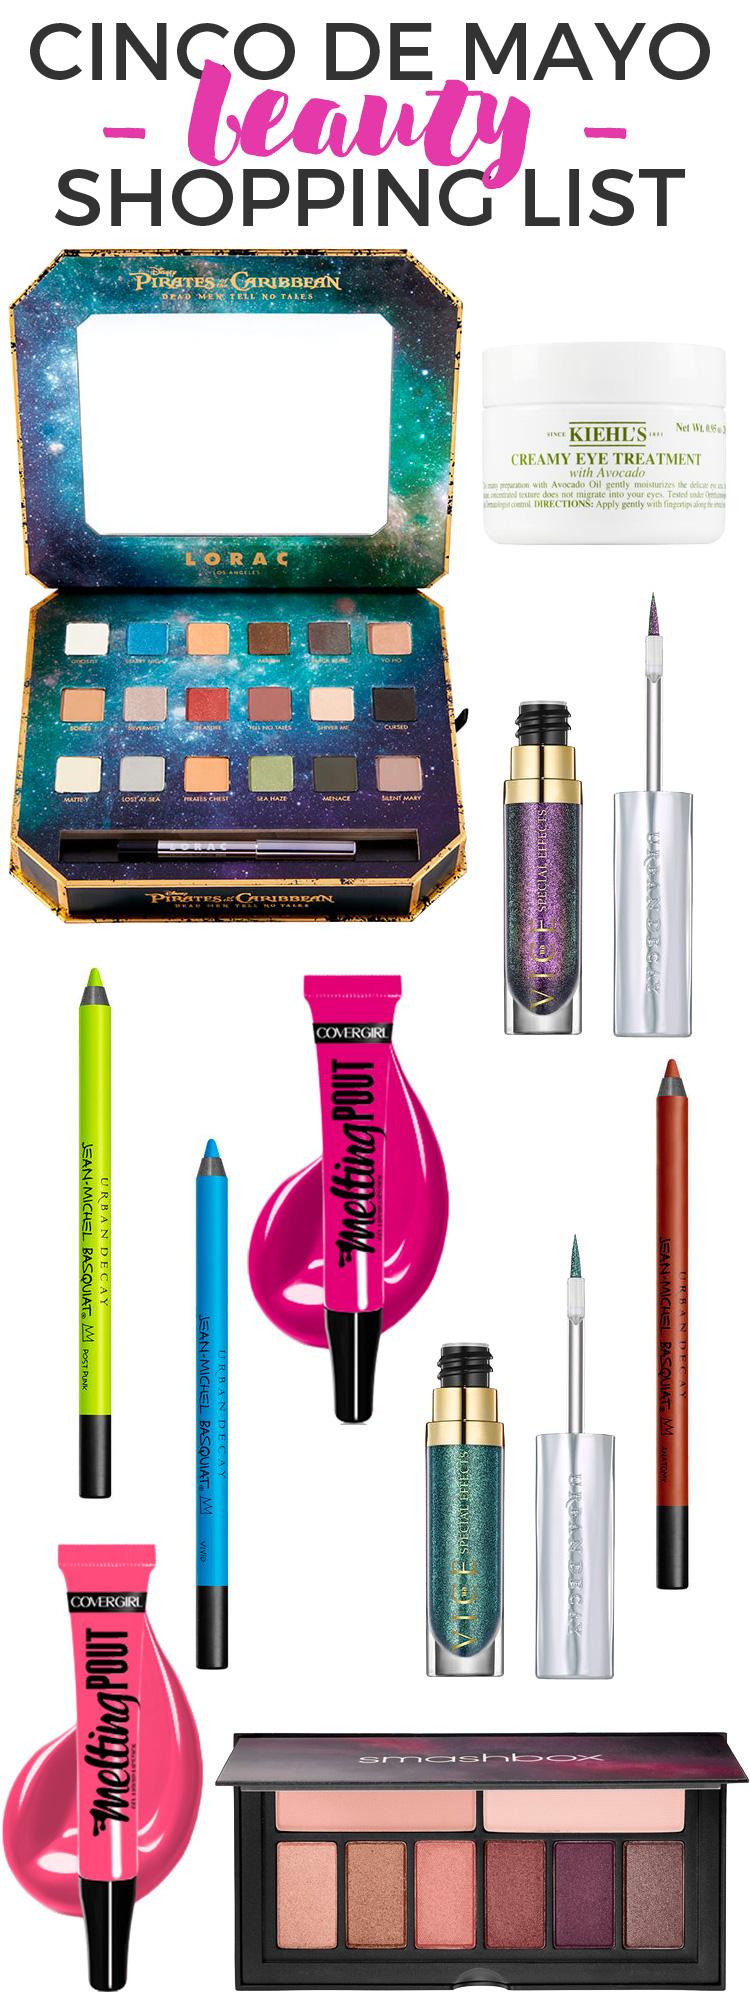 Cinco de Mayo Beauty Shopping List